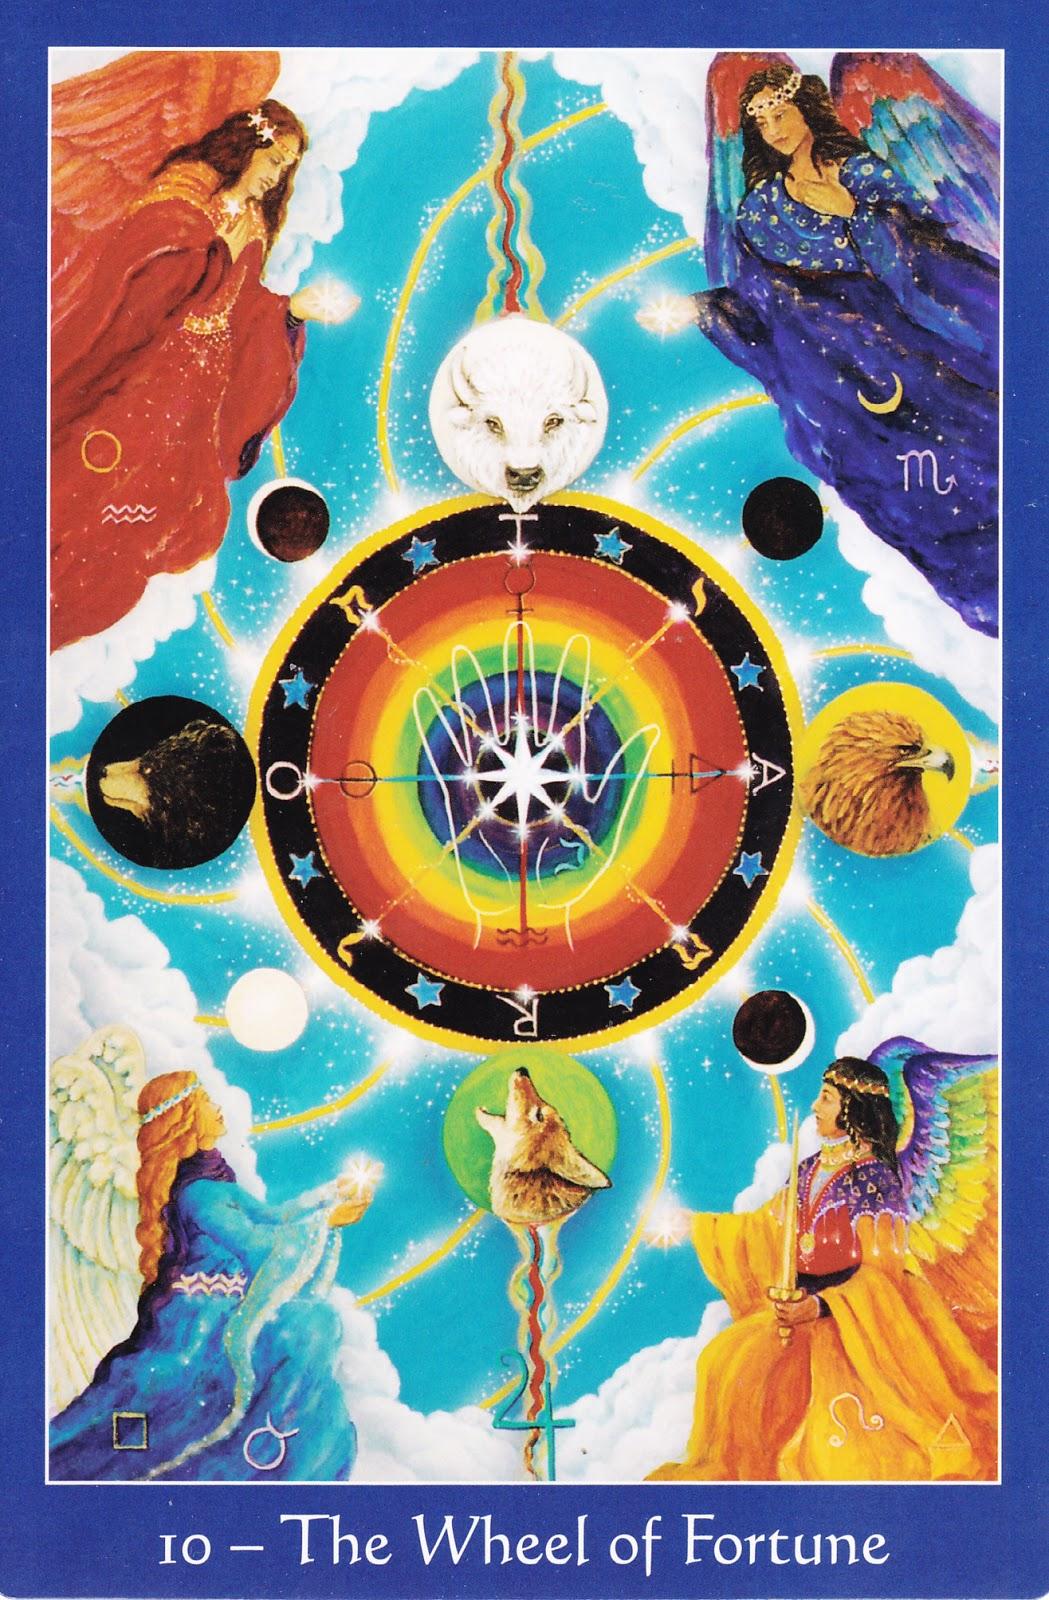 The Star Tarot 9780764352997-Wheel of Fortune